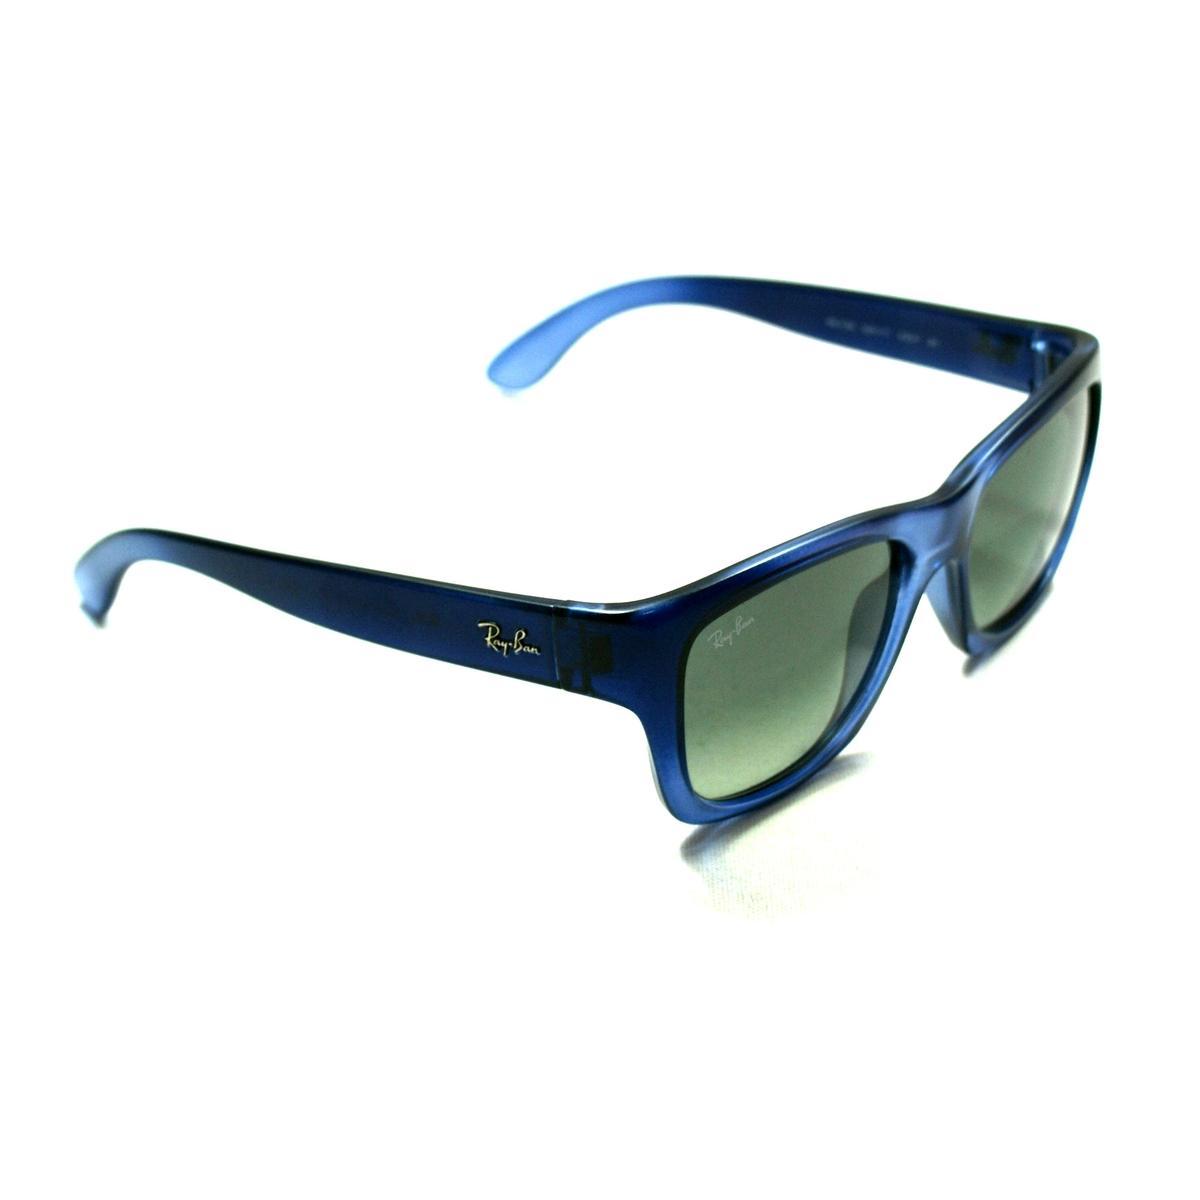 Ray Ban Glasses Frames Blue : blue frame ray ban aviators